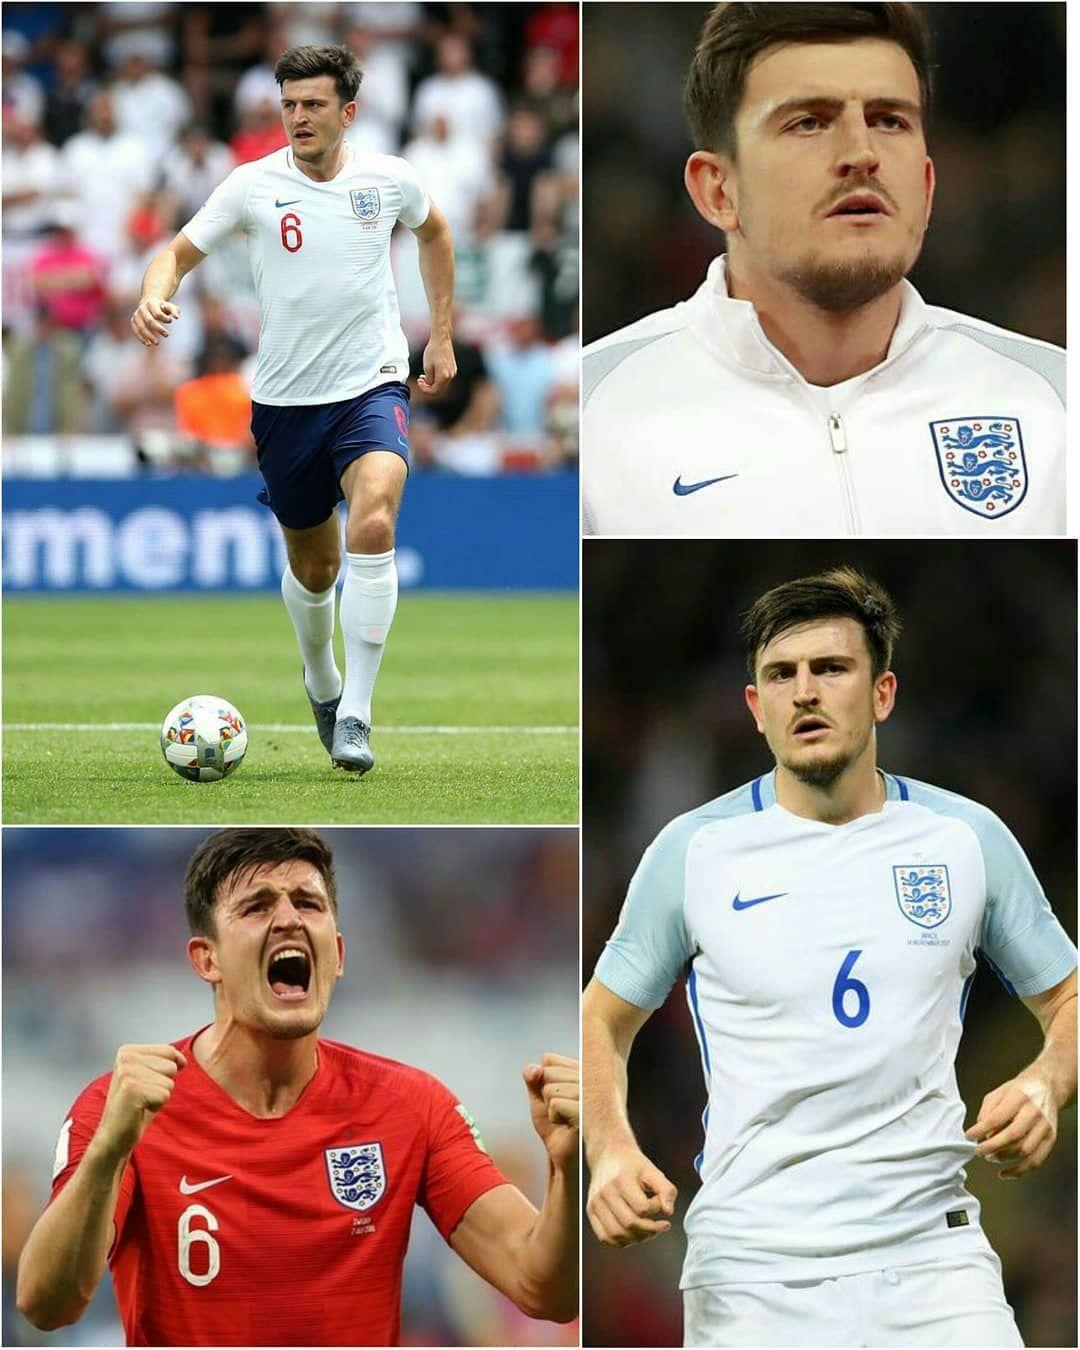 42 Likes 0 Comments England Football Teams England Football Team On Instagram Harry Maguir England Football Team England National Team England Football